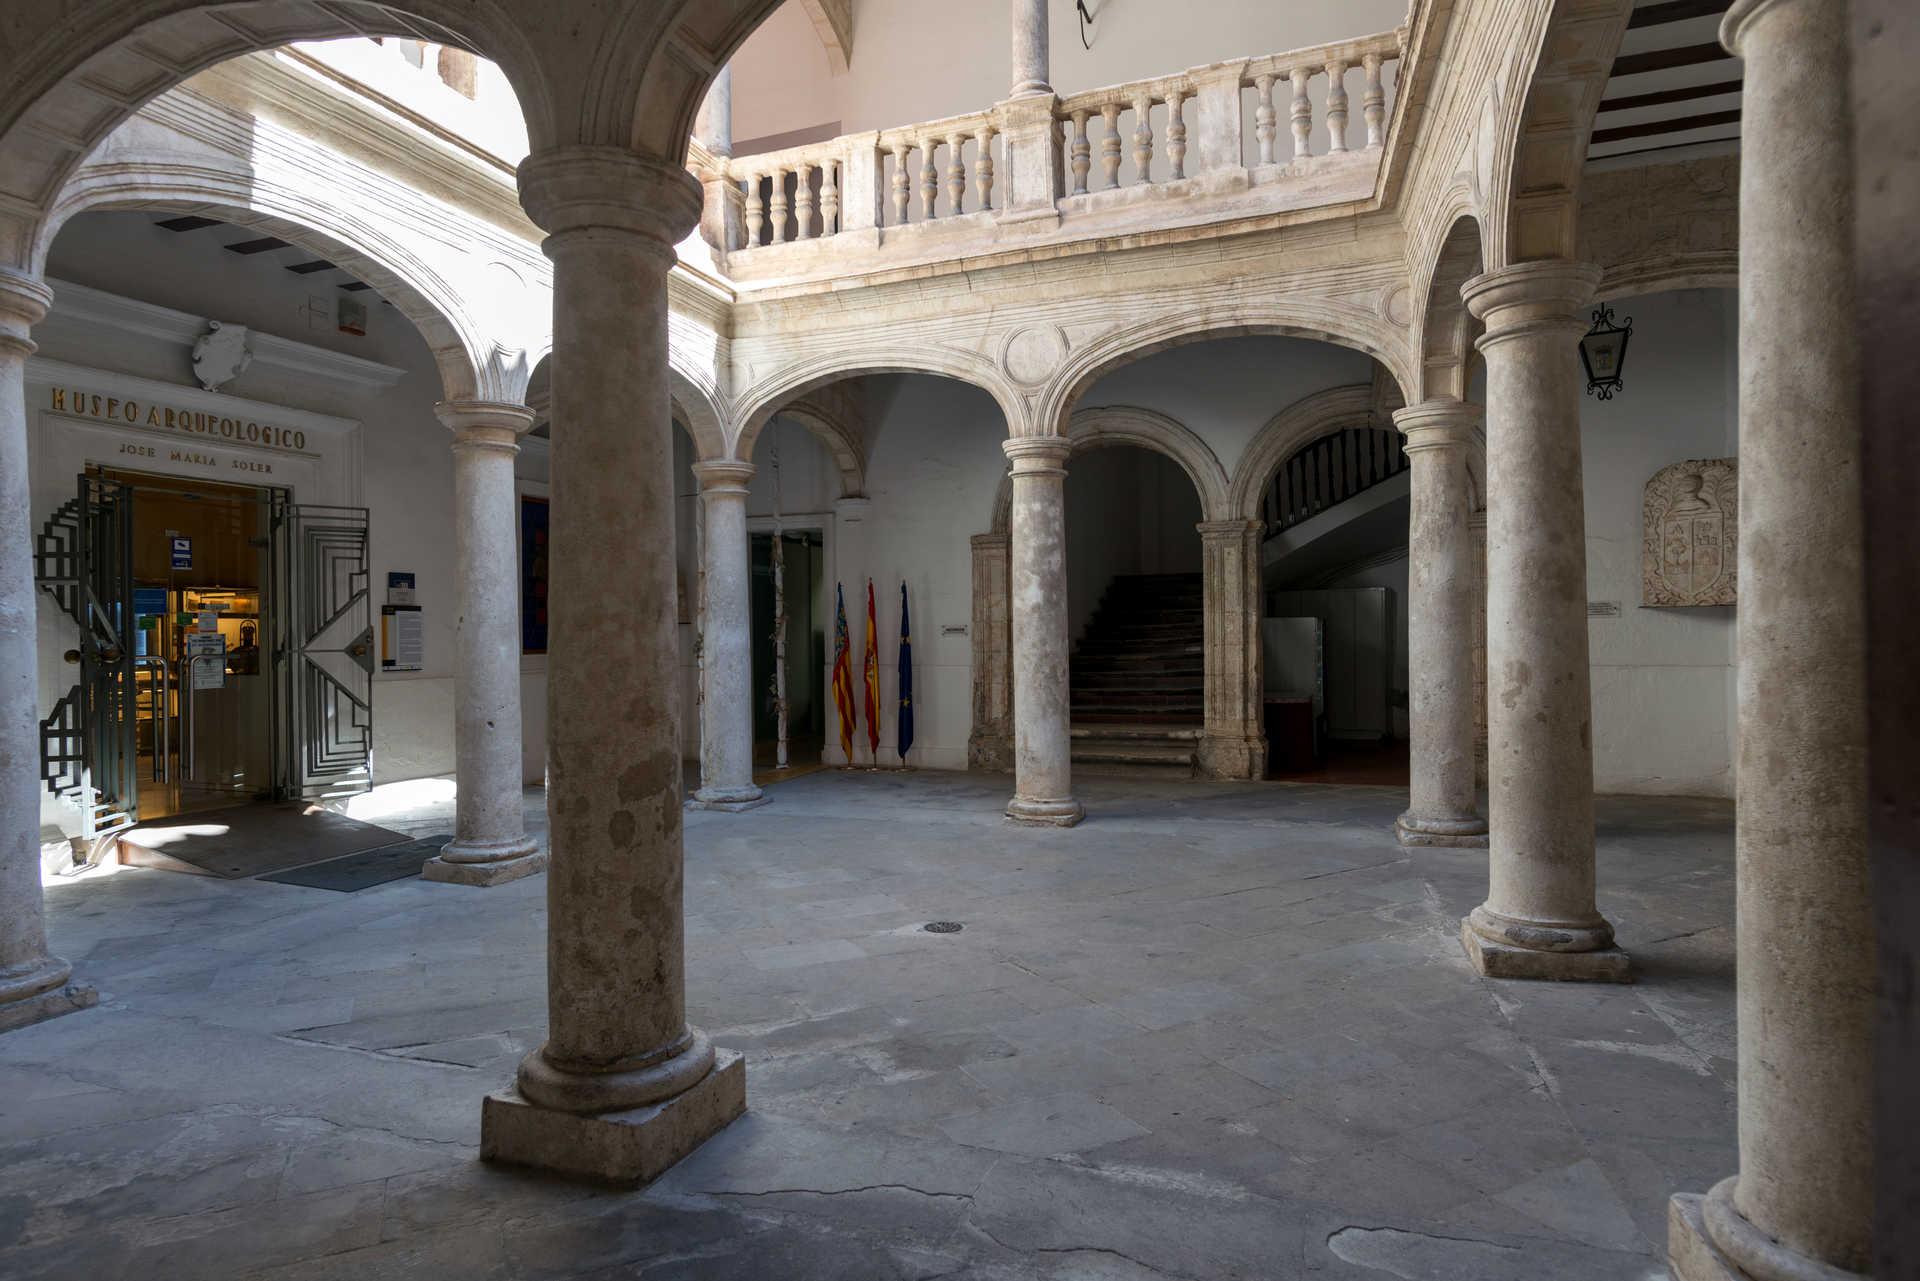 Archäologisches Museum José Mª Soler